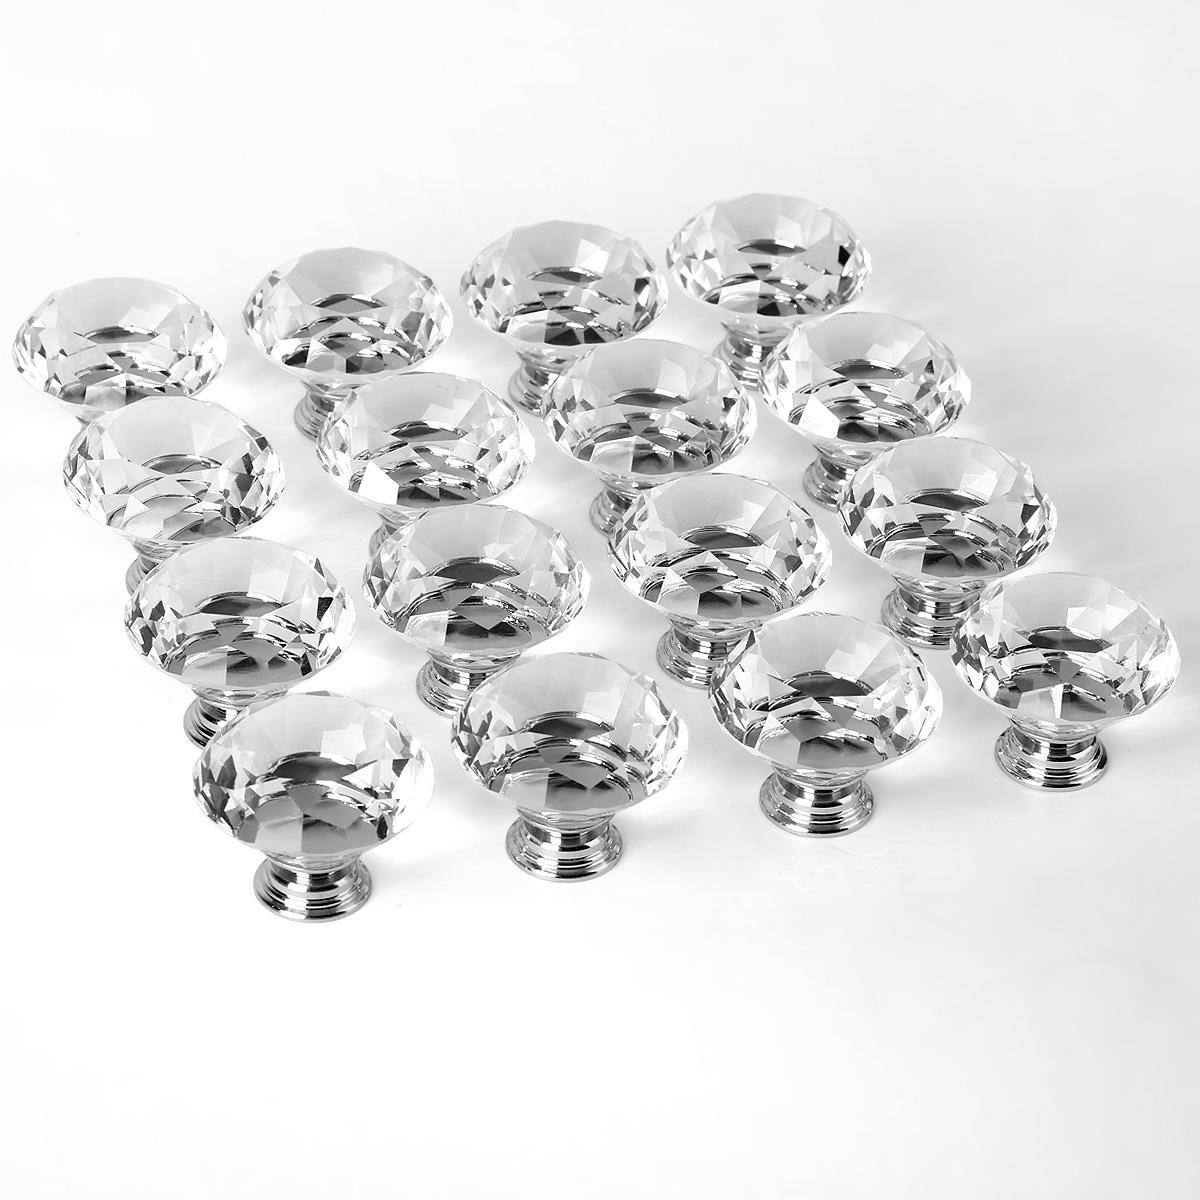 16pcs 40mm pomo de cristal vidrio tiradores para puertas - Tiradores y pomos ...